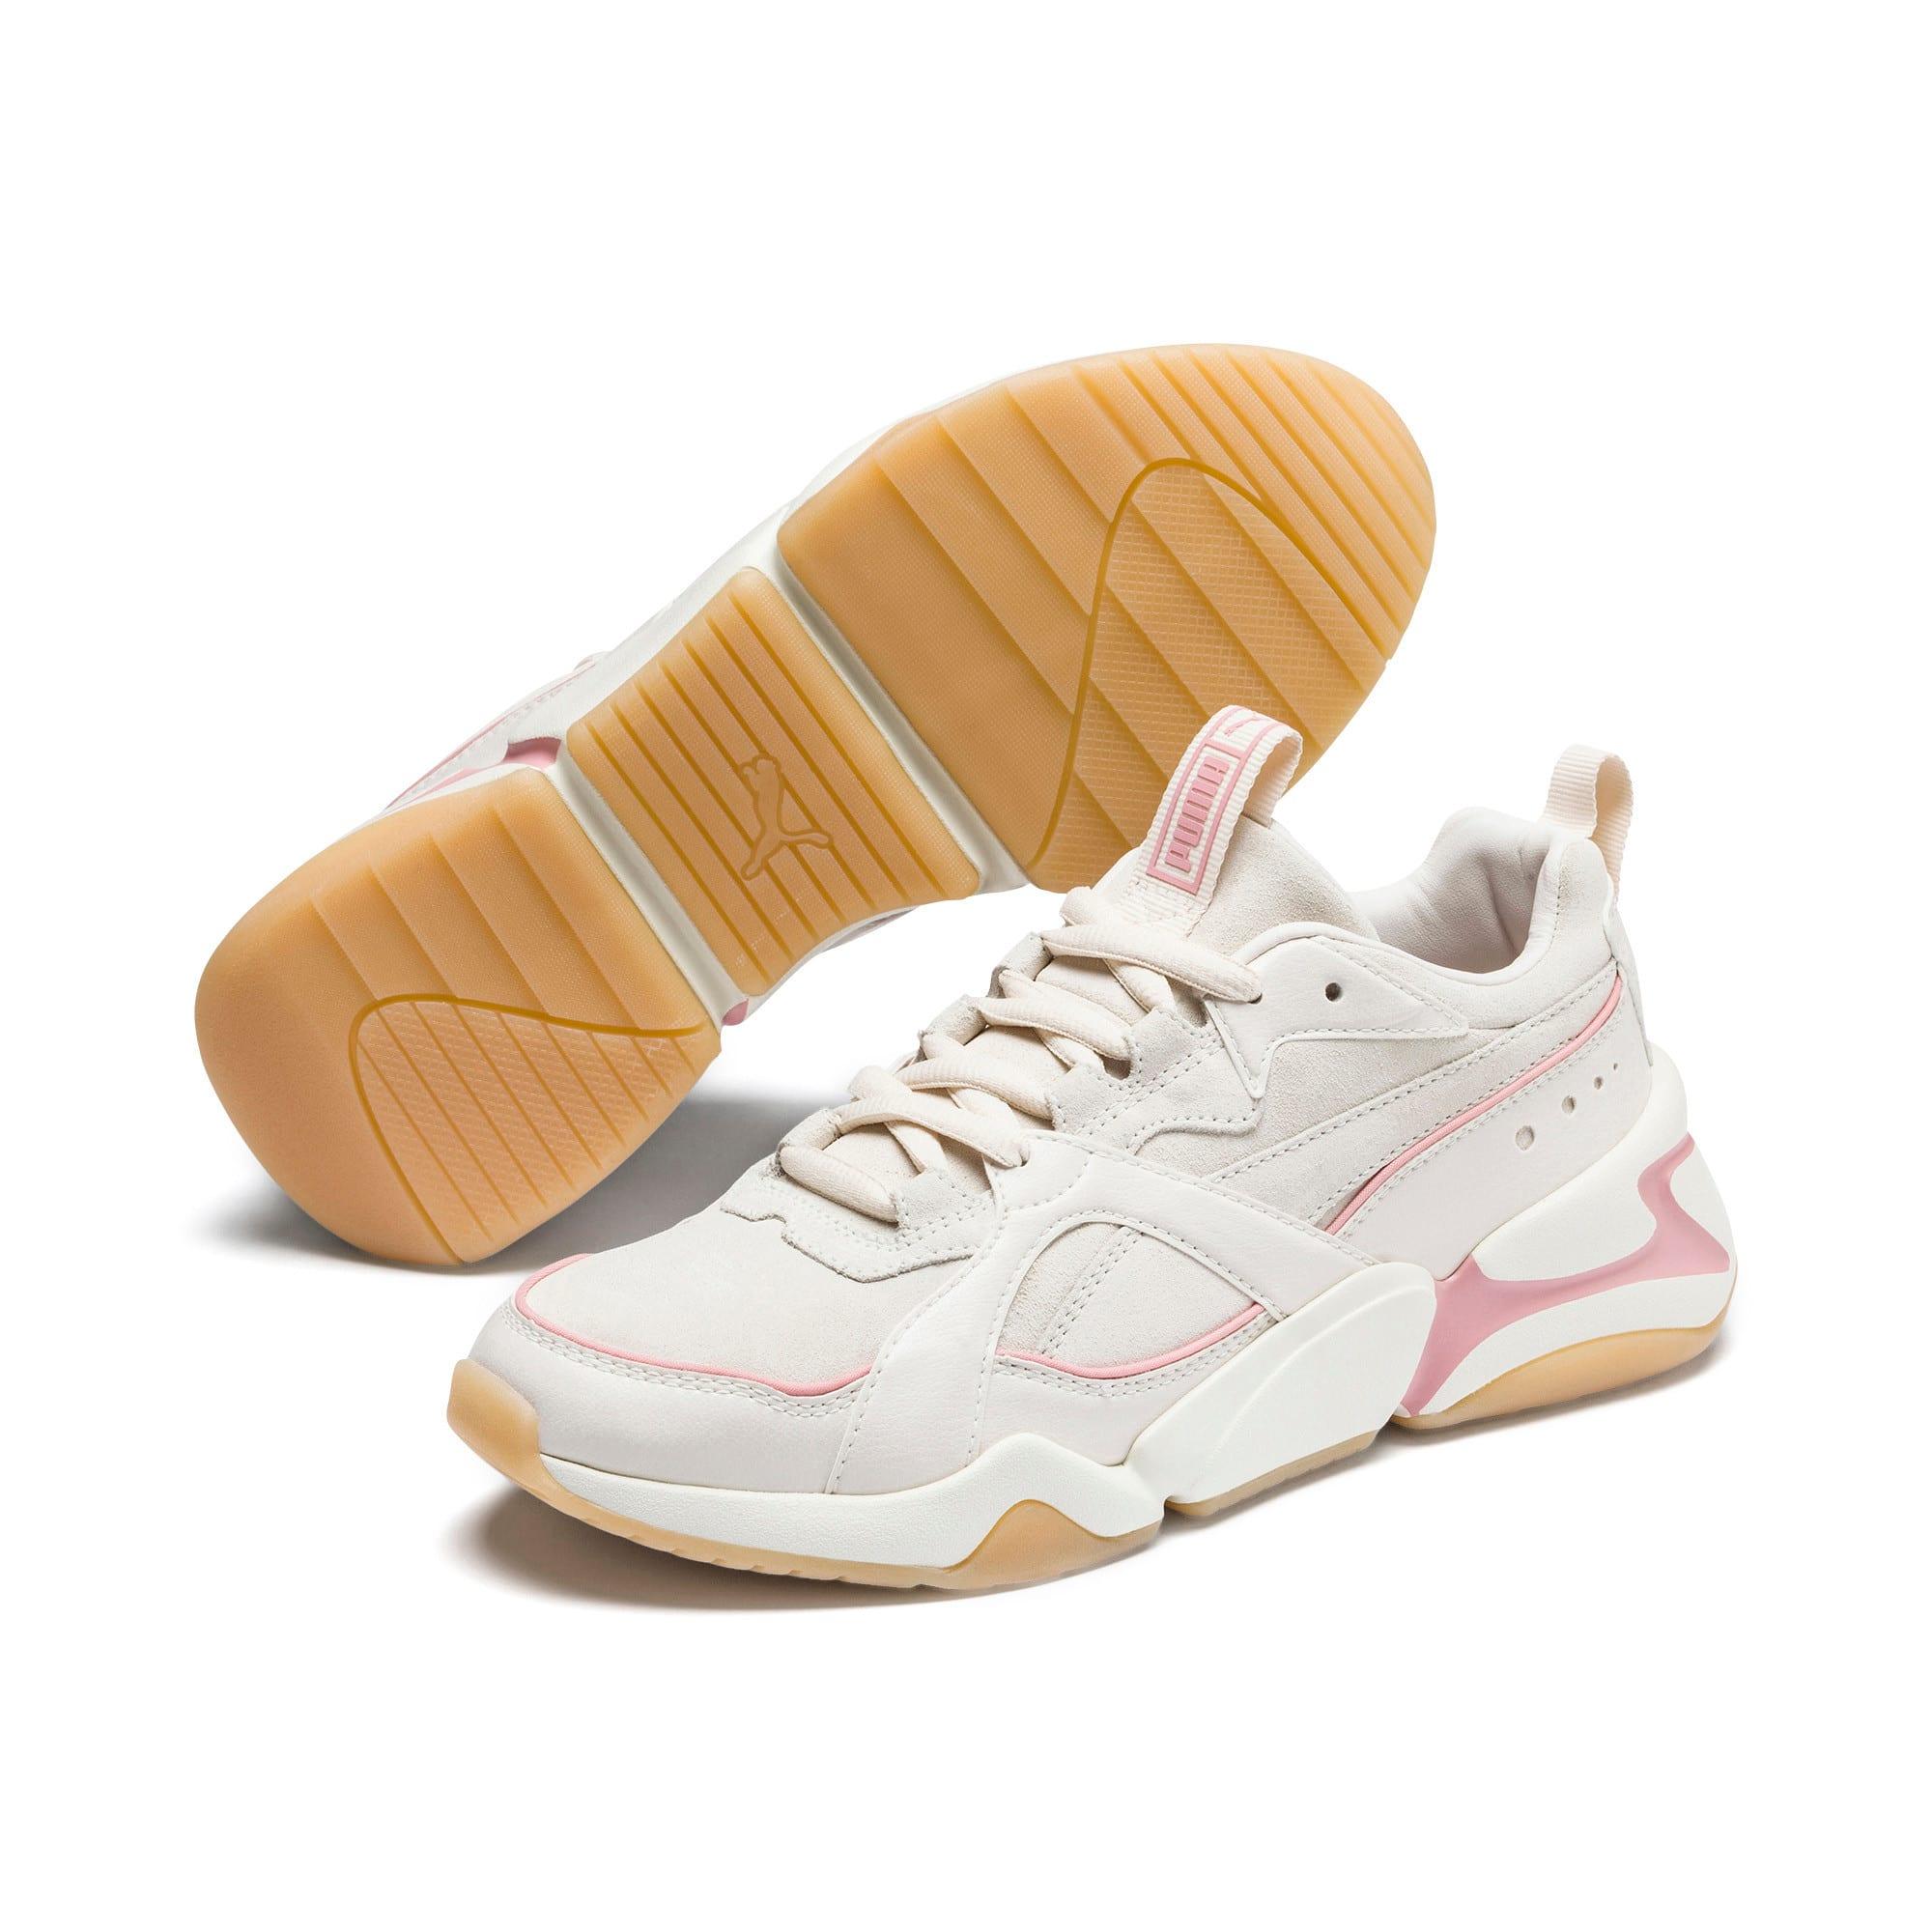 Thumbnail 3 of Nova 2 Suede Women's Sneakers, Pastel Parchment-Whisp White, medium